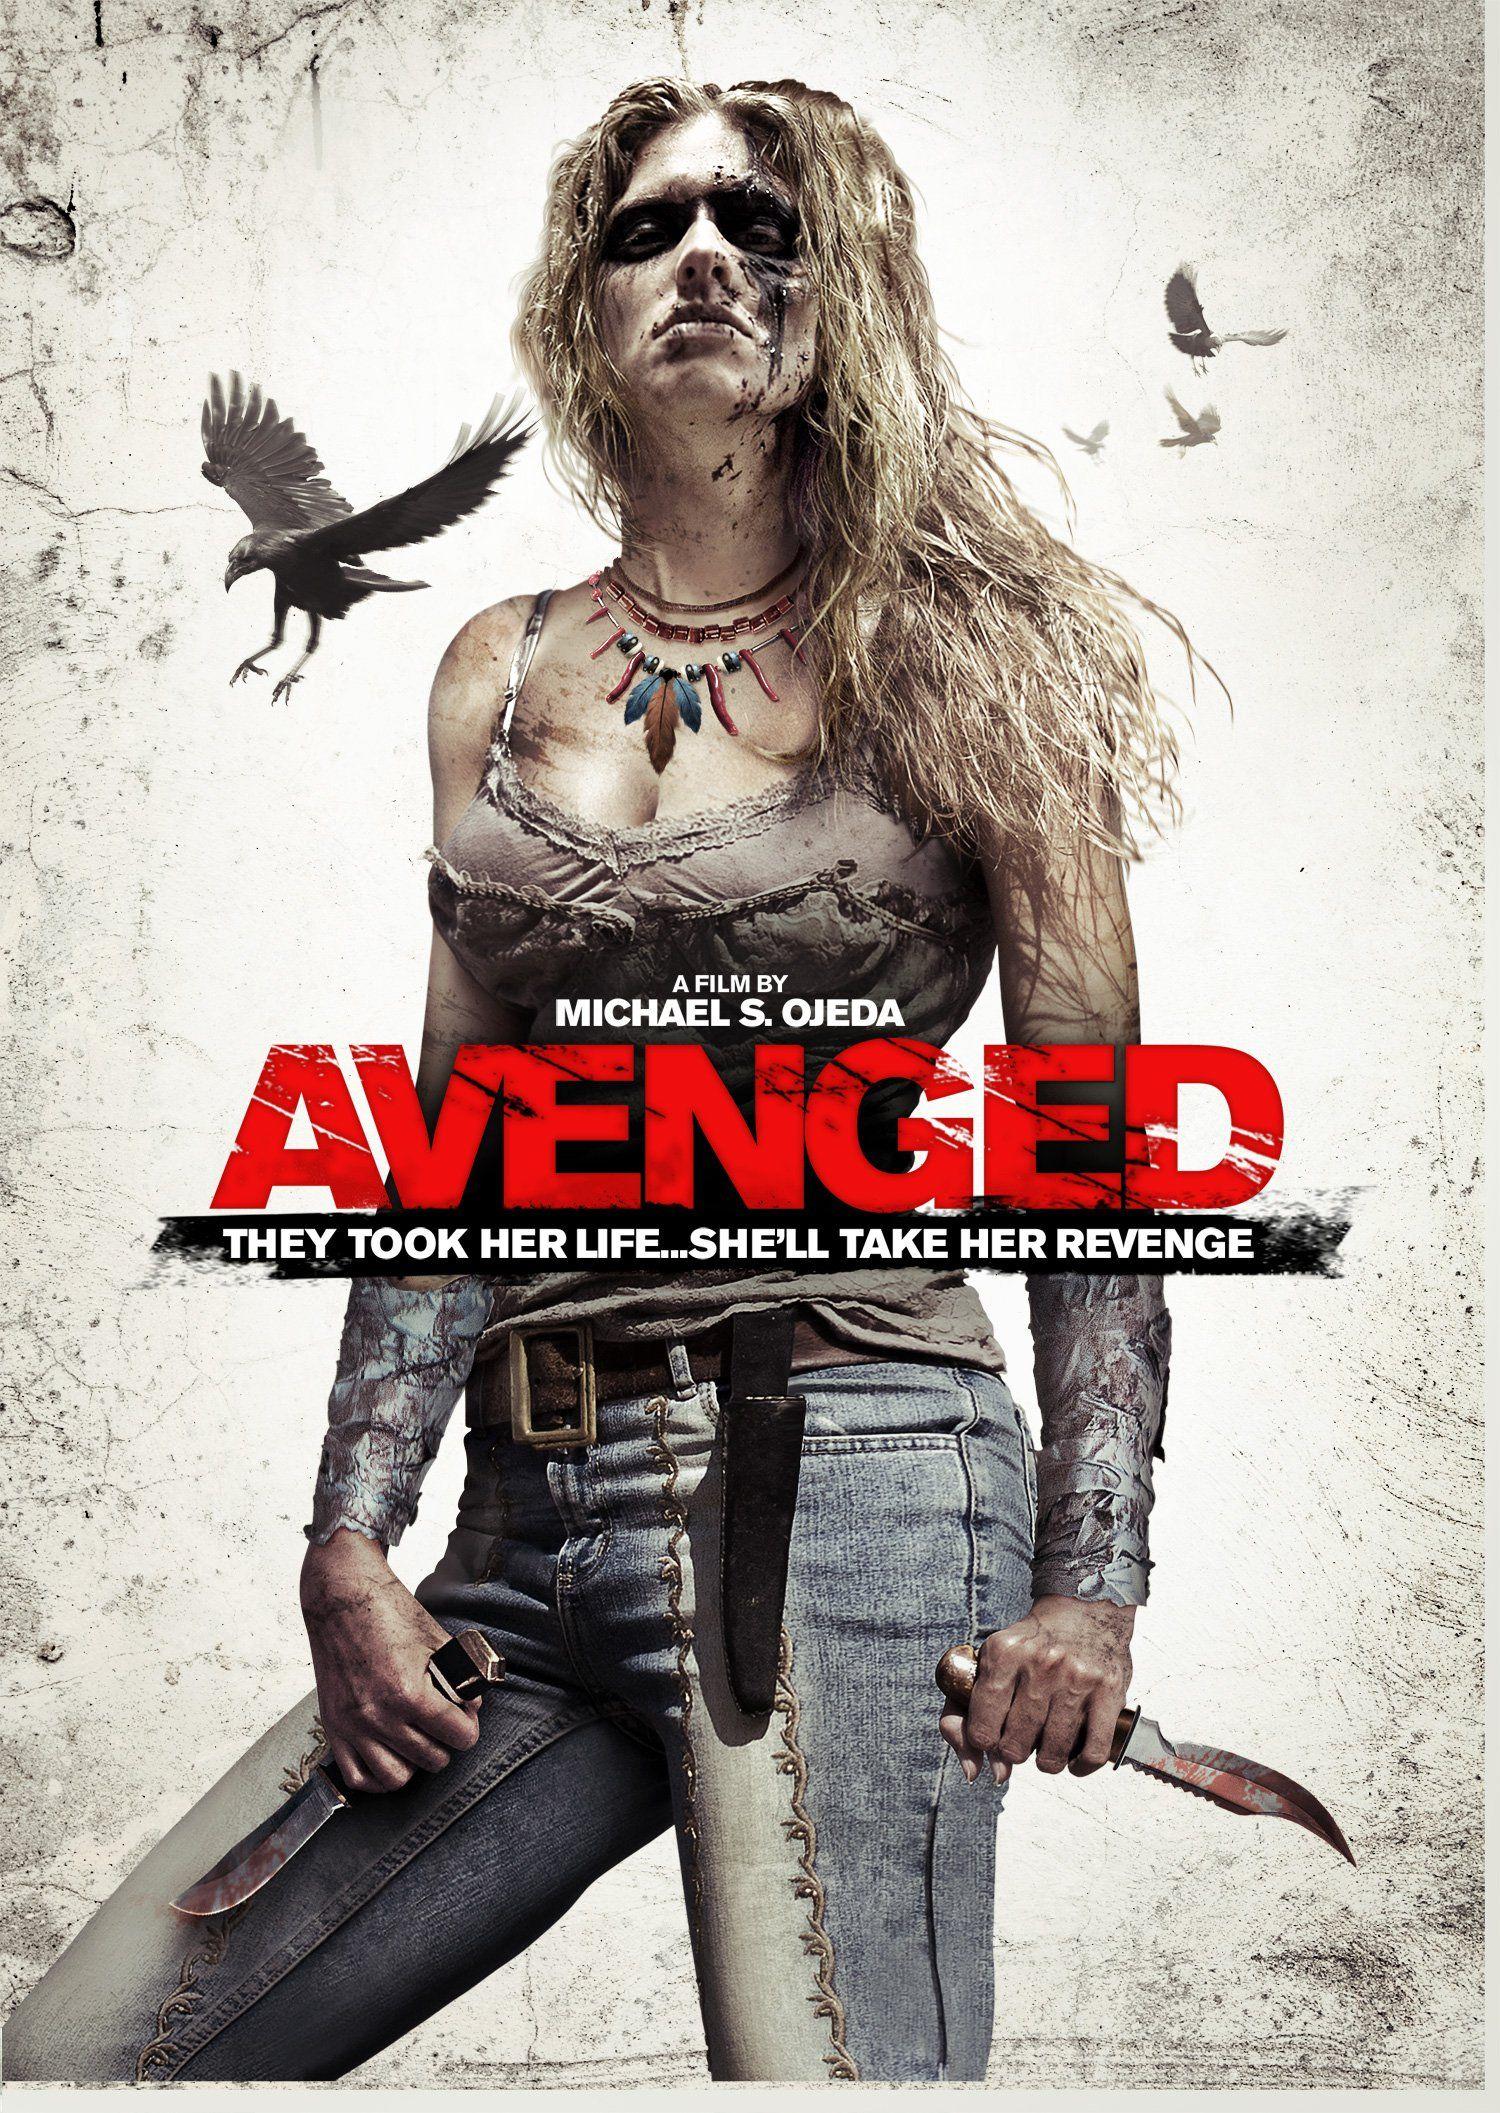 Avenged (2013) Movie in 2020 New movies, Horror movie